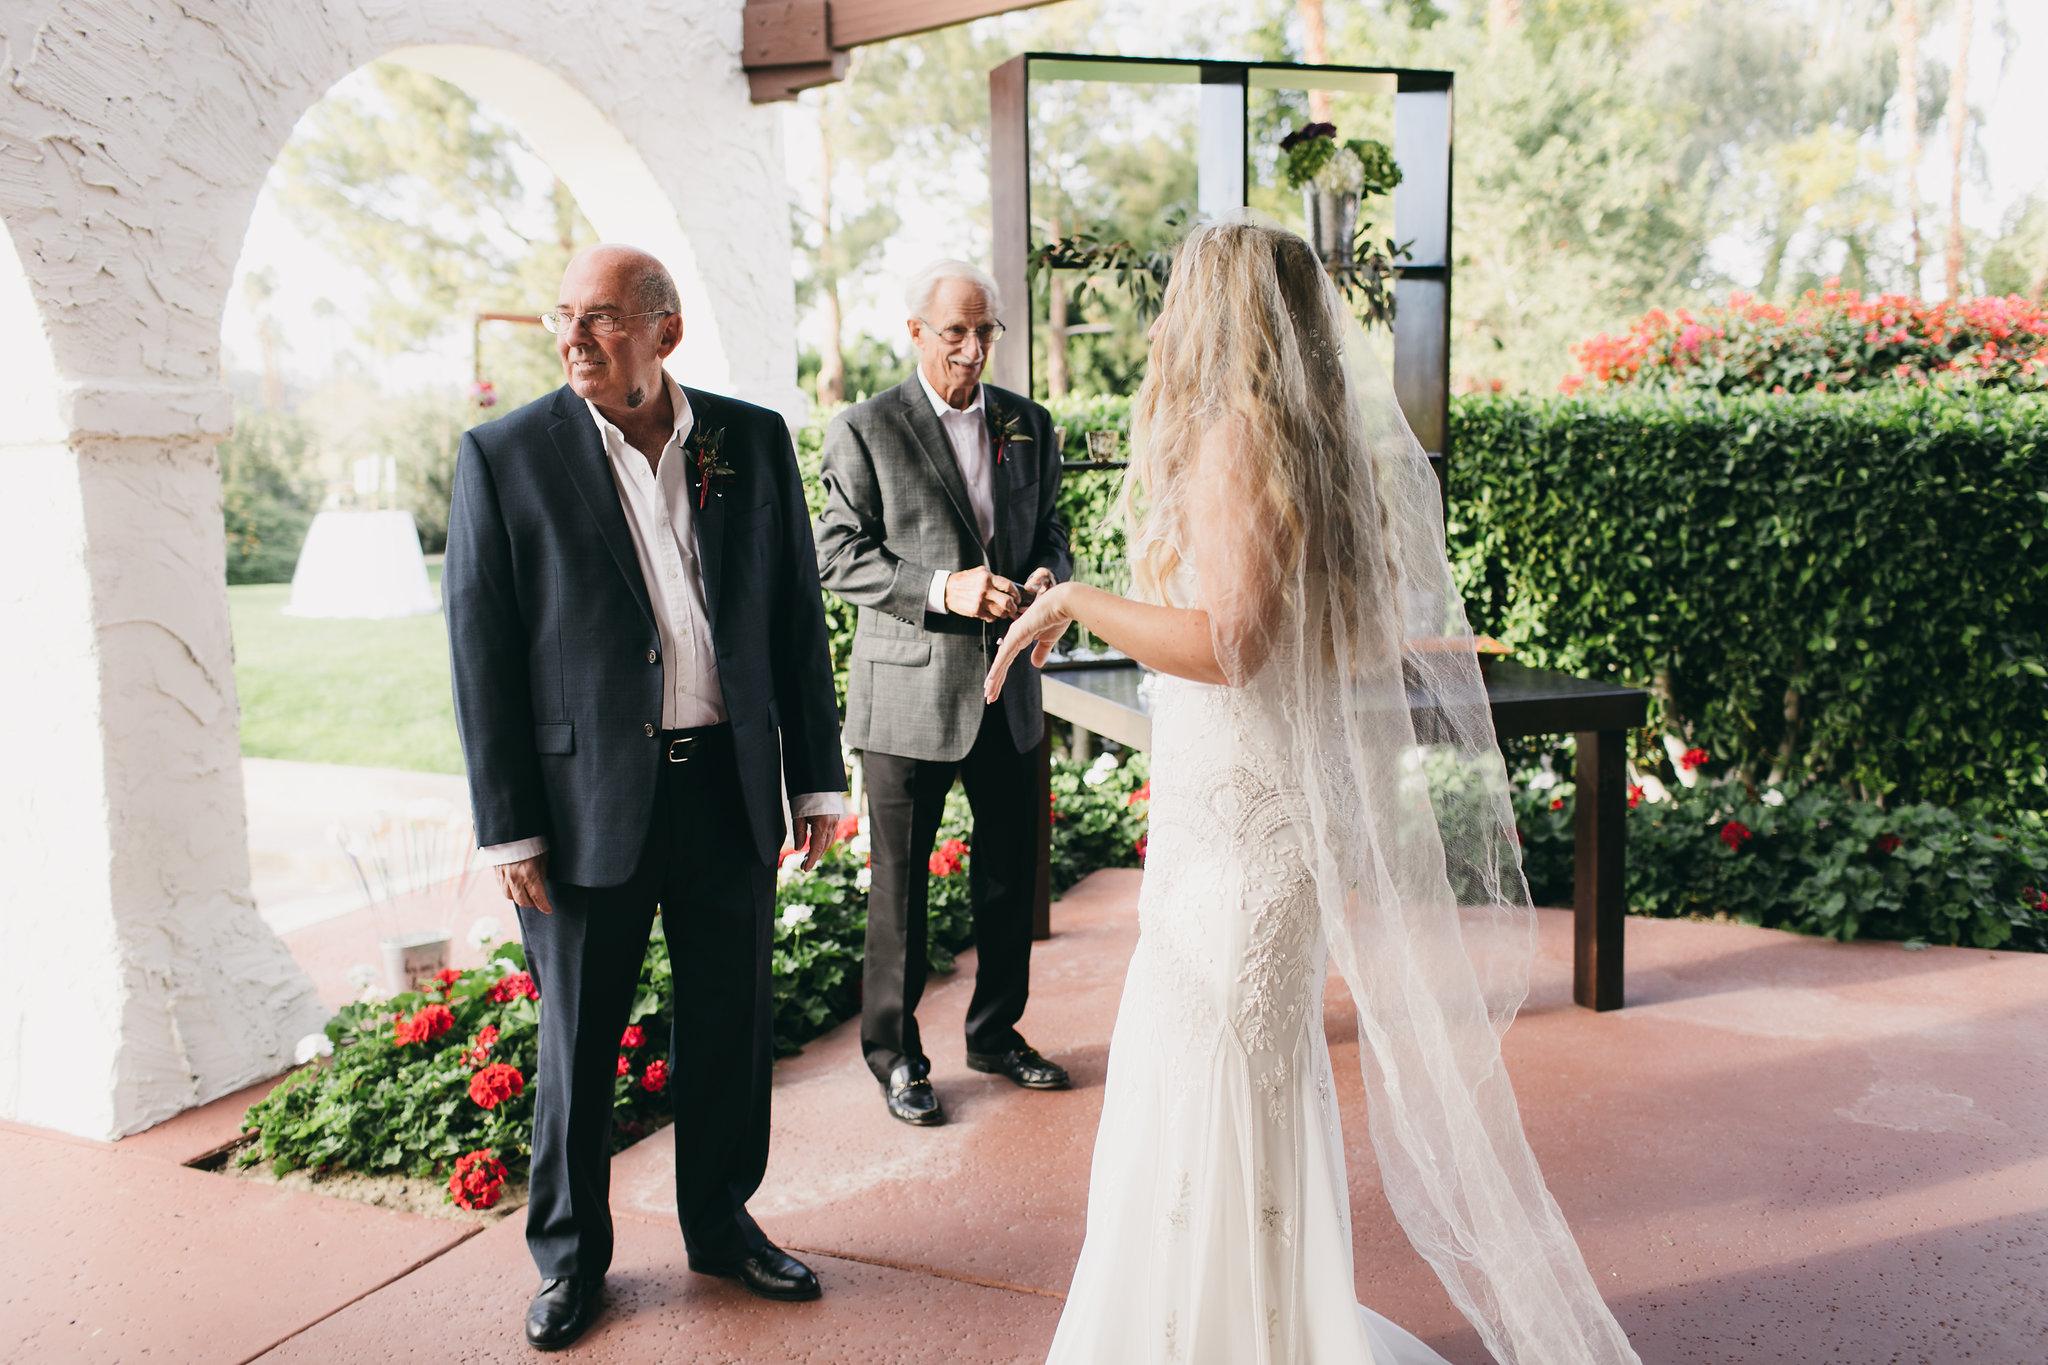 Gracy-Andrew-Wedding-194.jpg